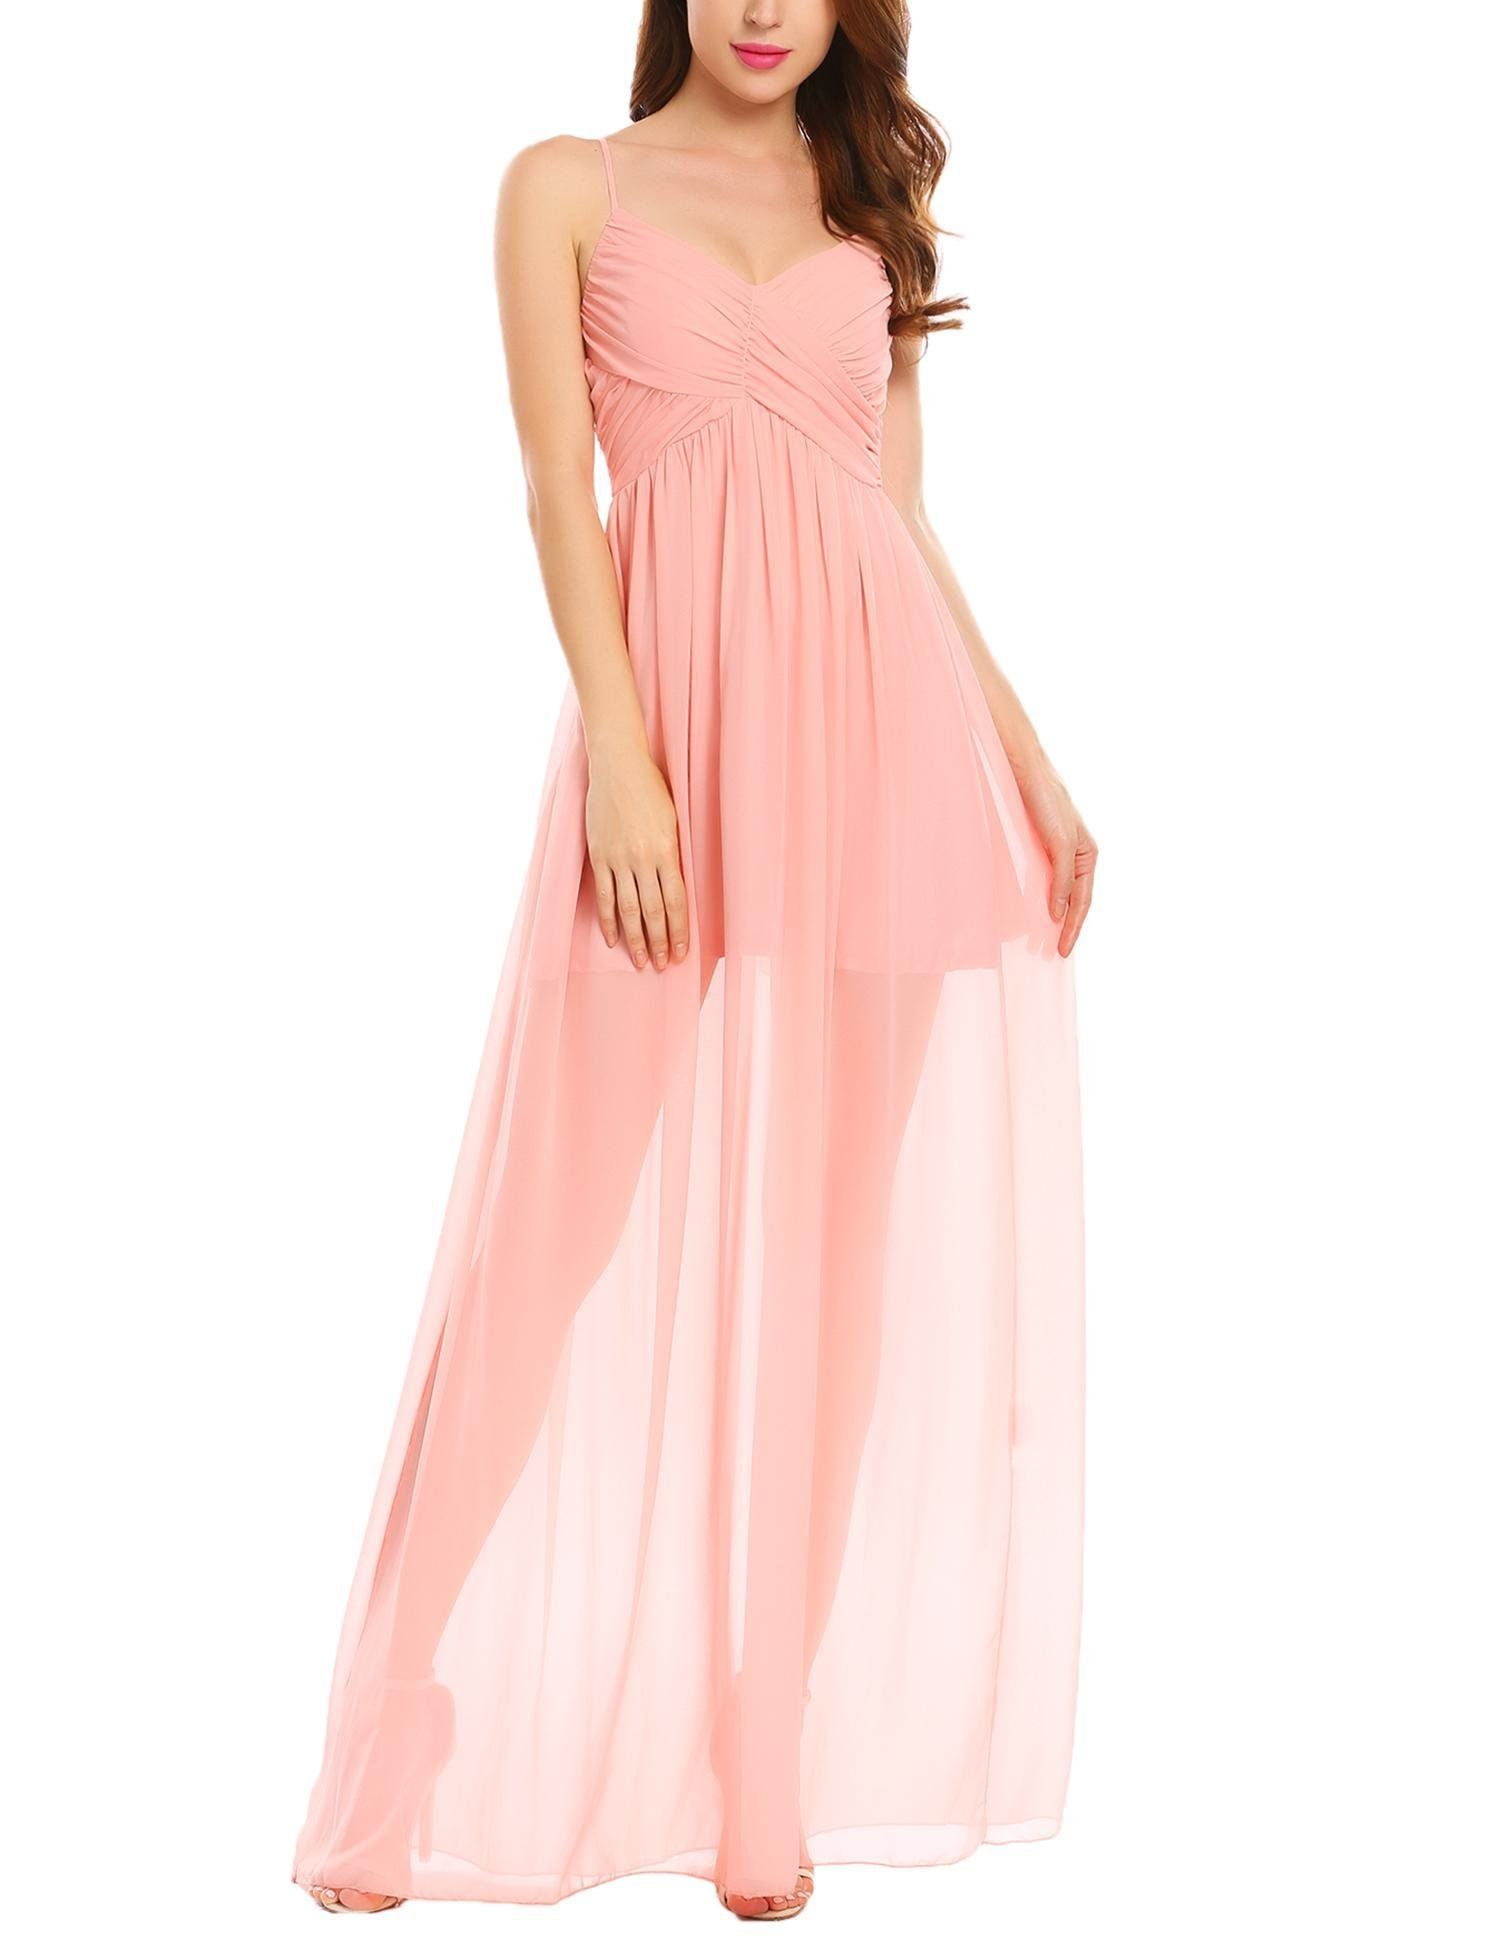 Available at Amazon: Tobecy Women's Sexy Chiffon Dresses V-Neck Spaghetti Strap Backless High Waist Maxi Long Evening Dress